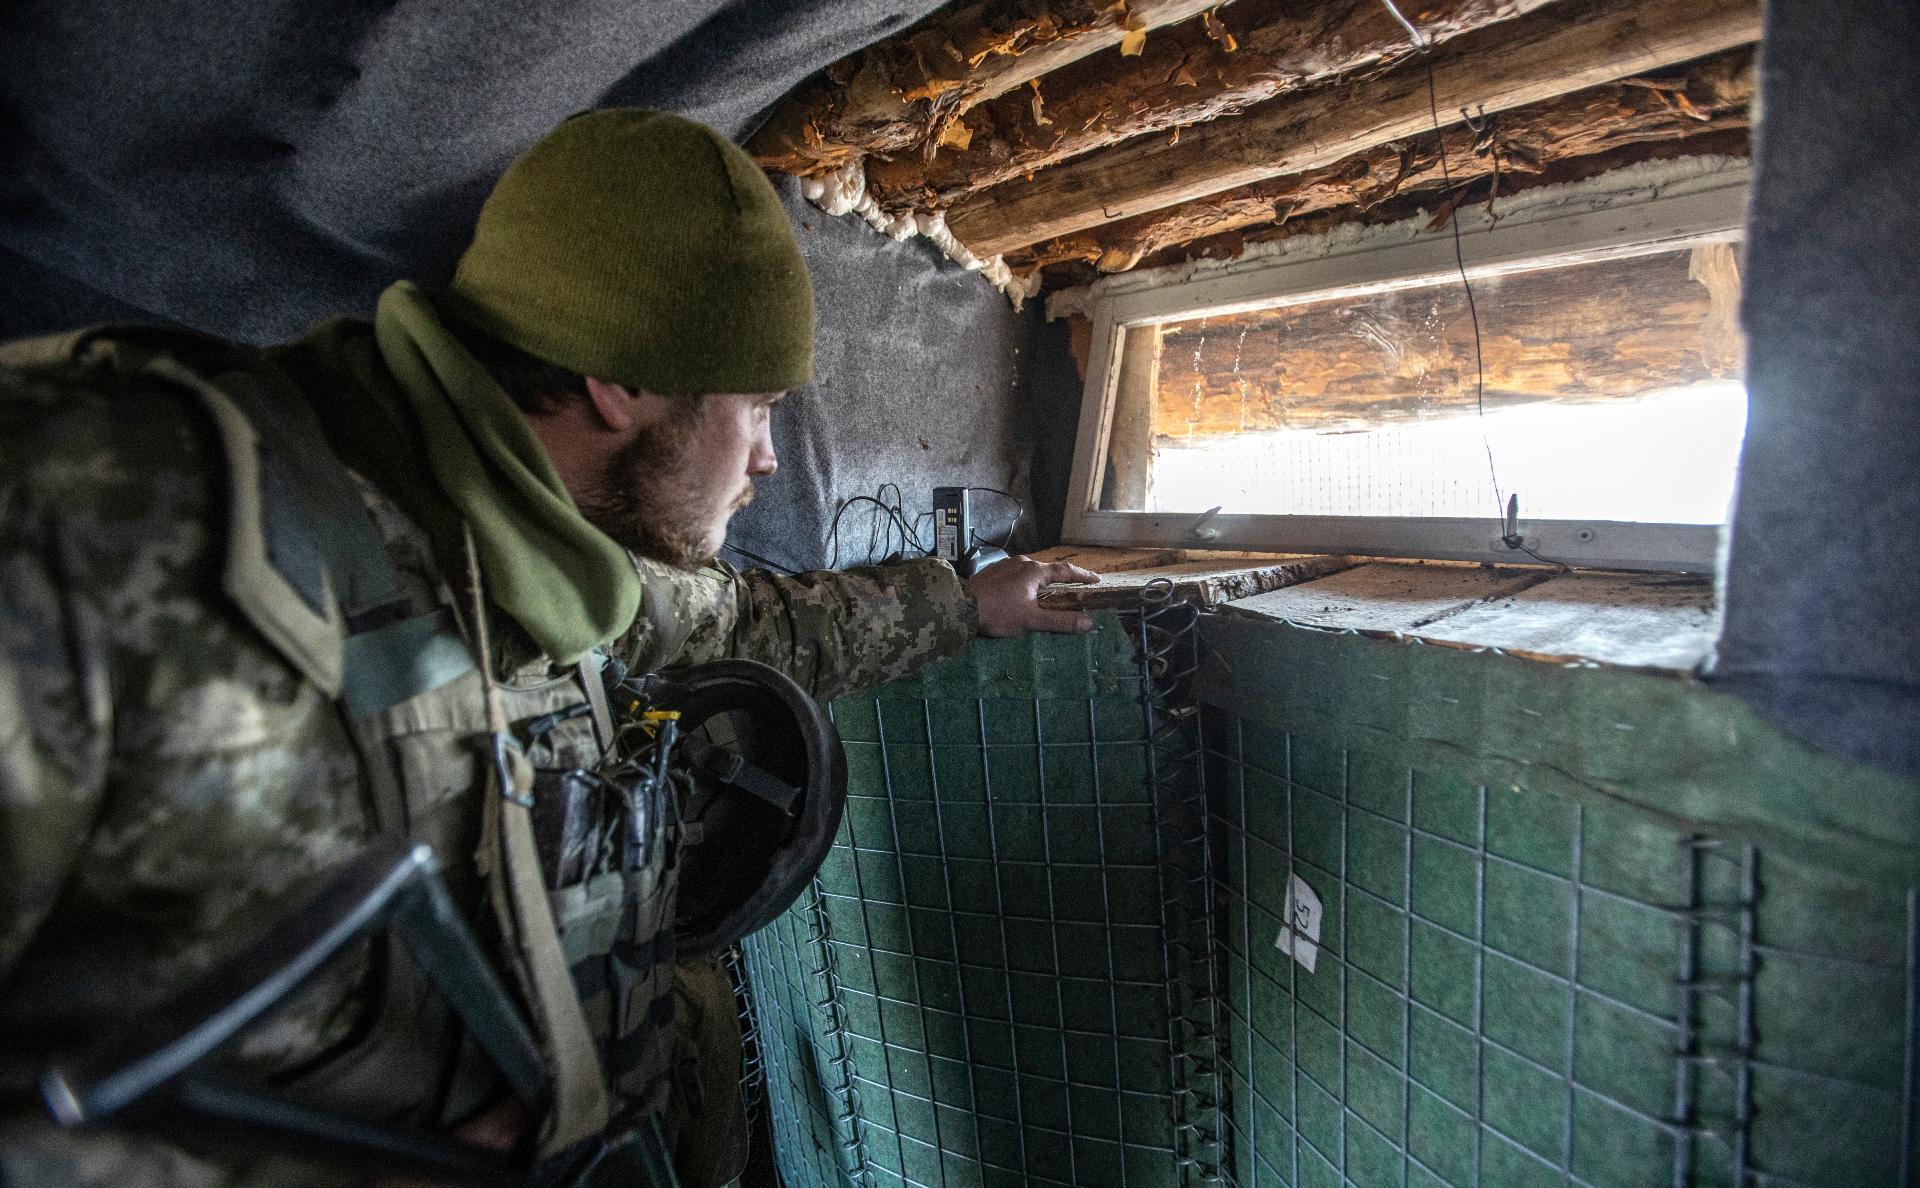 Фото:Влад Стасов / EPA / ТАСС